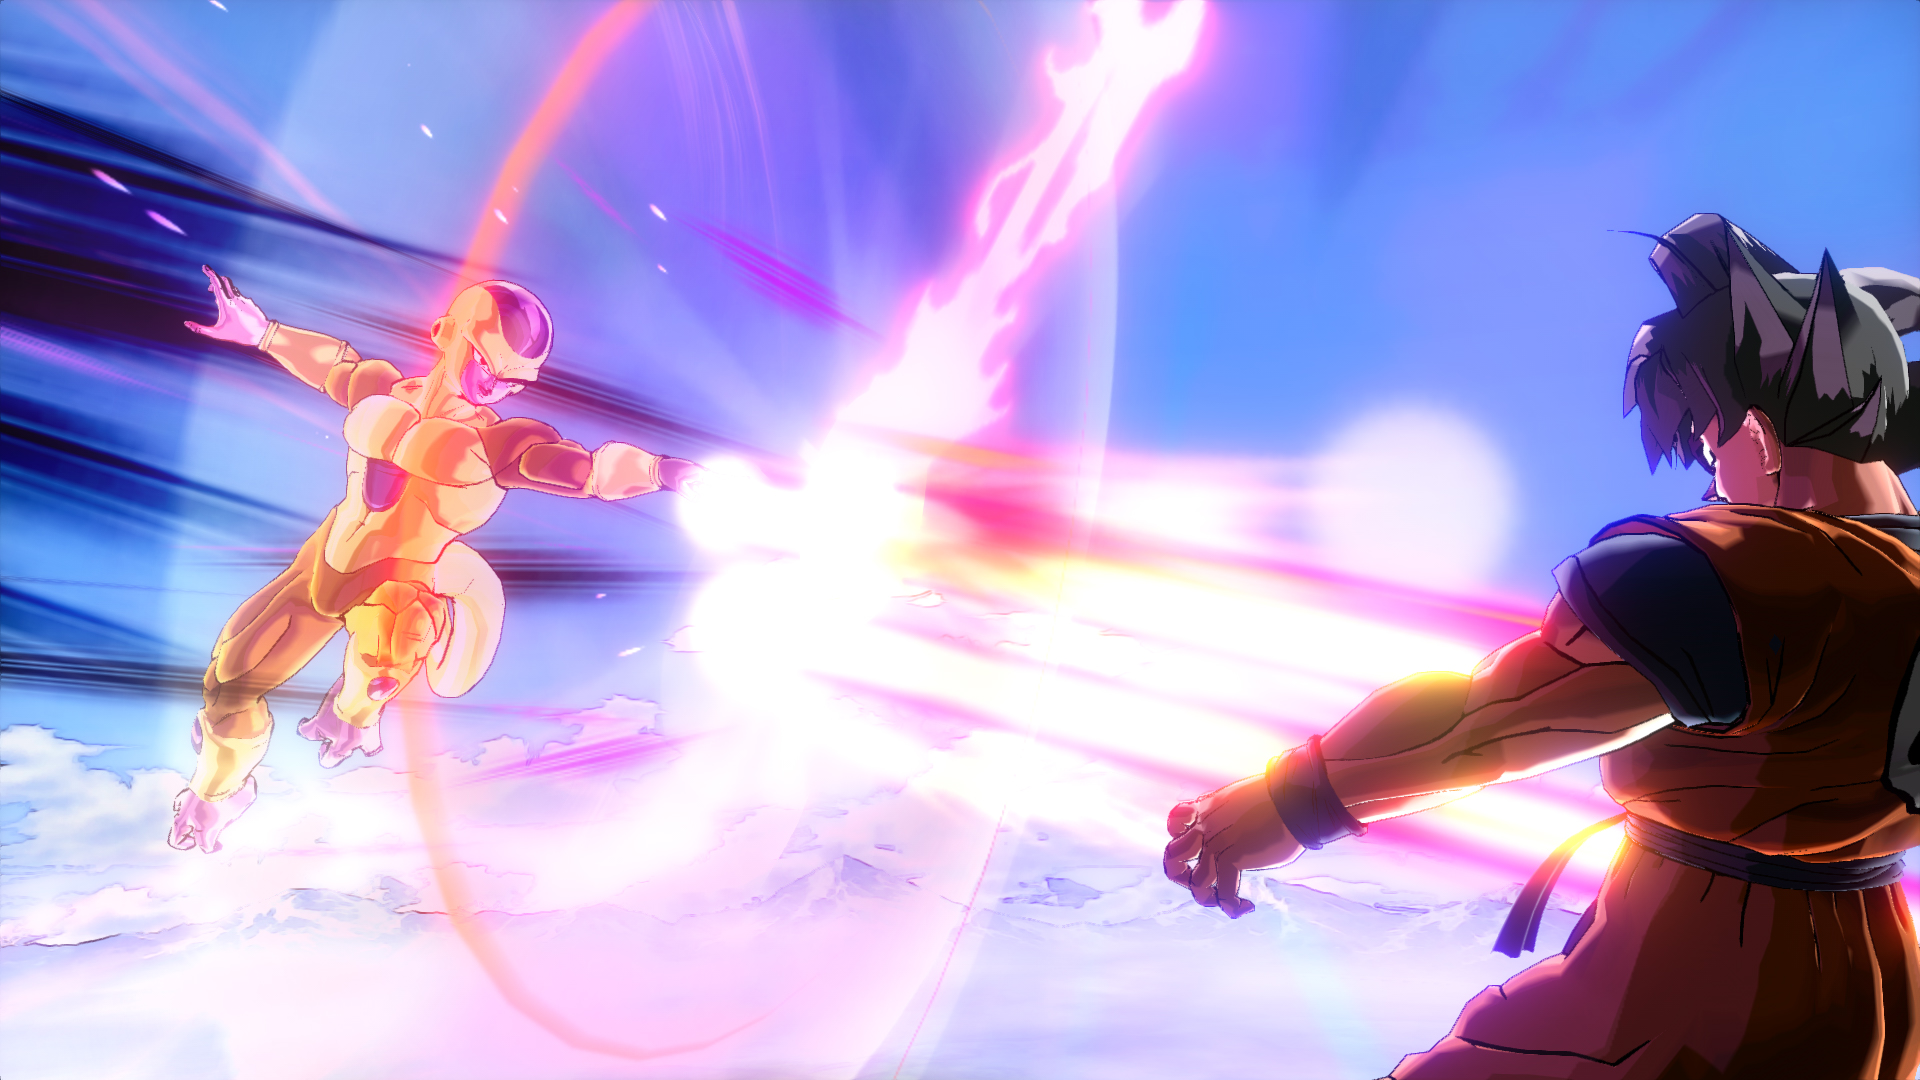 DRAGON BALL Z: Resurrection 'F' pack screenshot